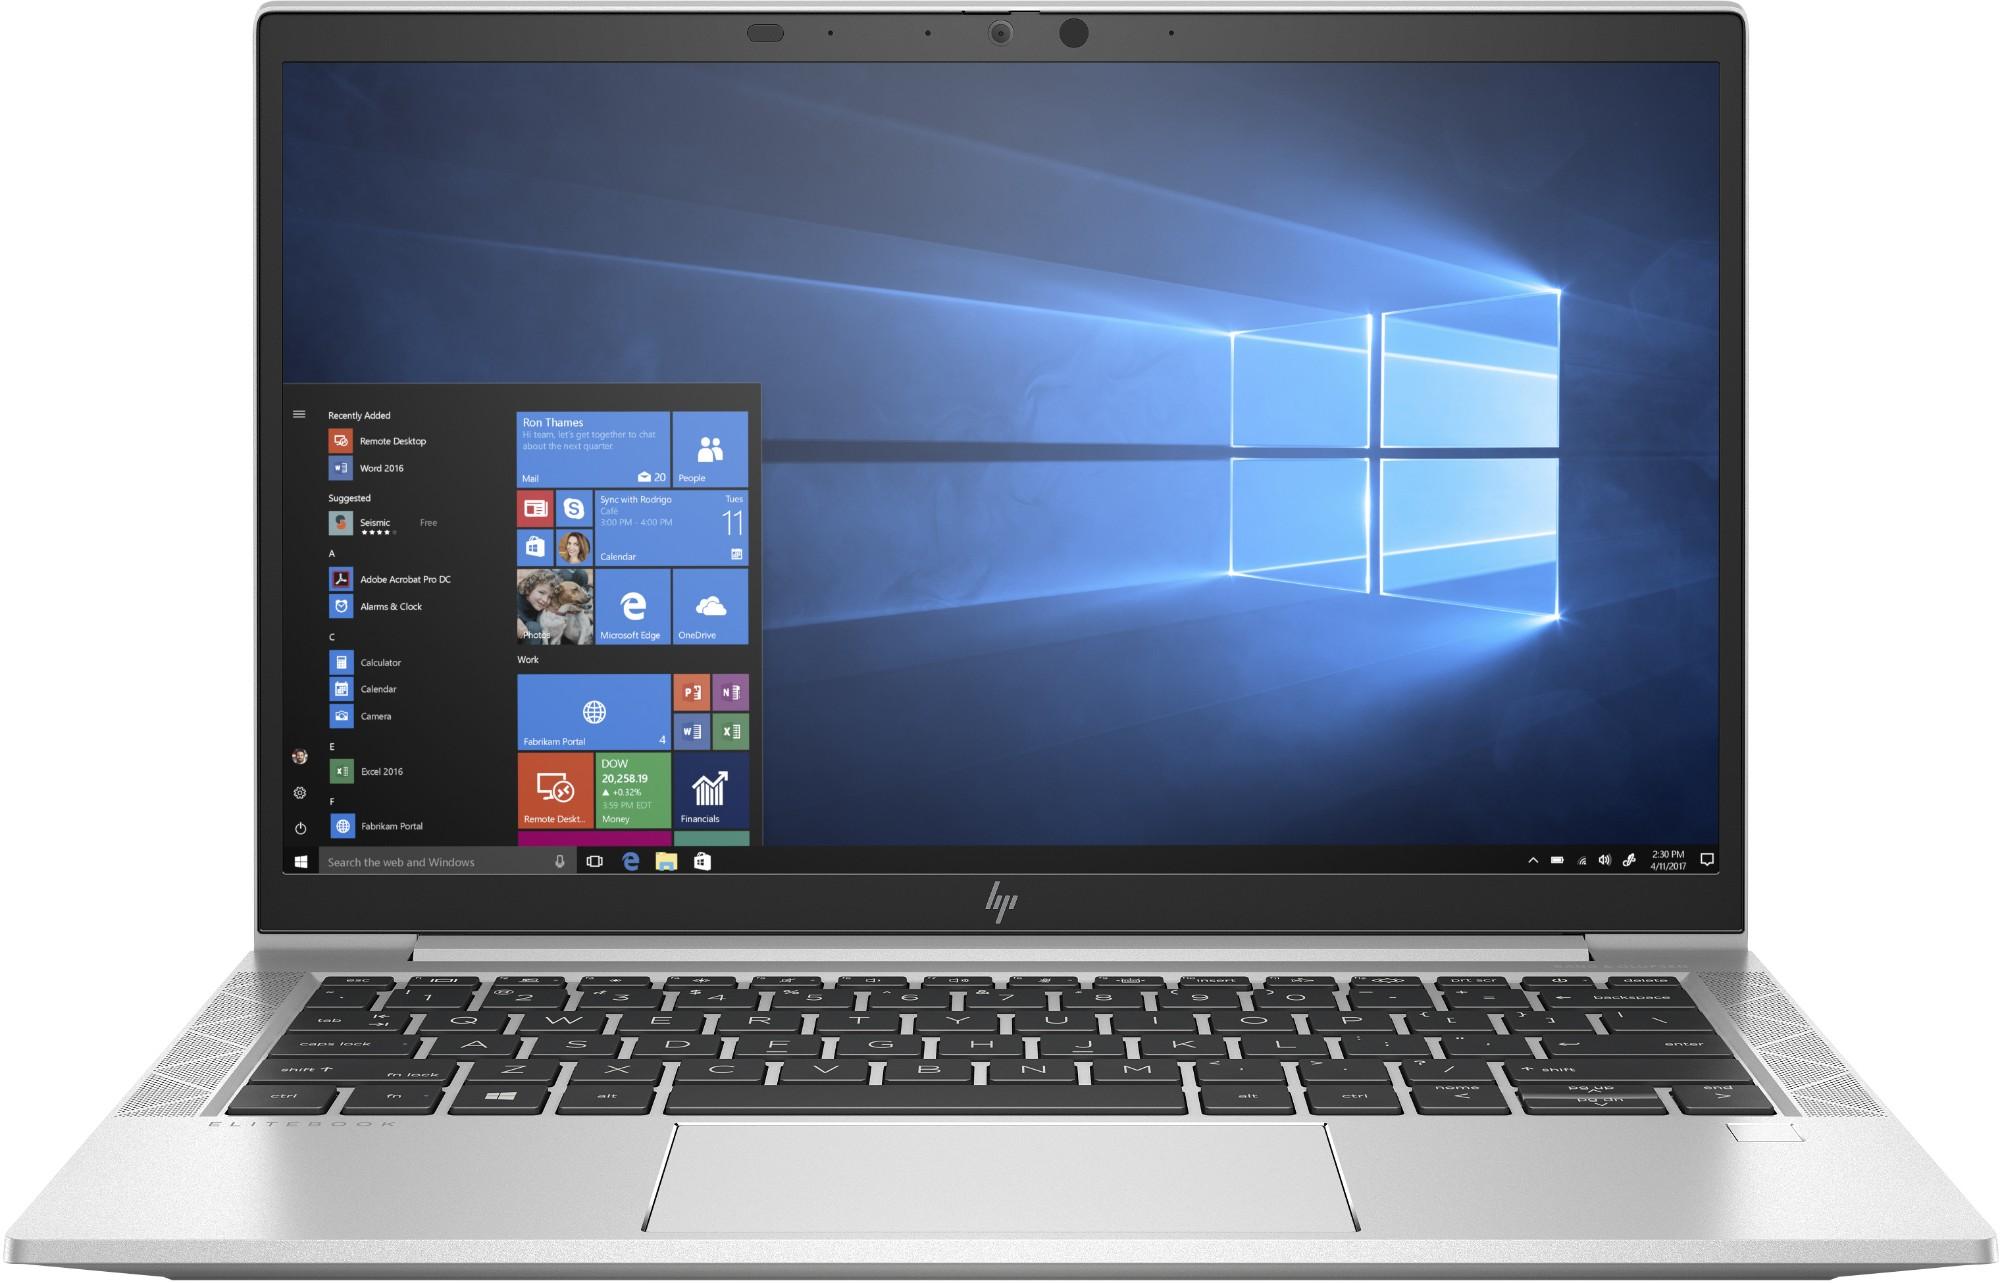 "HP EliteBook 830 G7 + Thunderbolt Dock 120W G2 Notebook Zilver 33,8 cm (13.3"") 1920 x 1080 Pixels Intel® 10de generatie Core™ i5 8 GB DDR4-SDRAM 256 GB SSD Wi-Fi 6 (802.11ax) Windows 10 Pro"